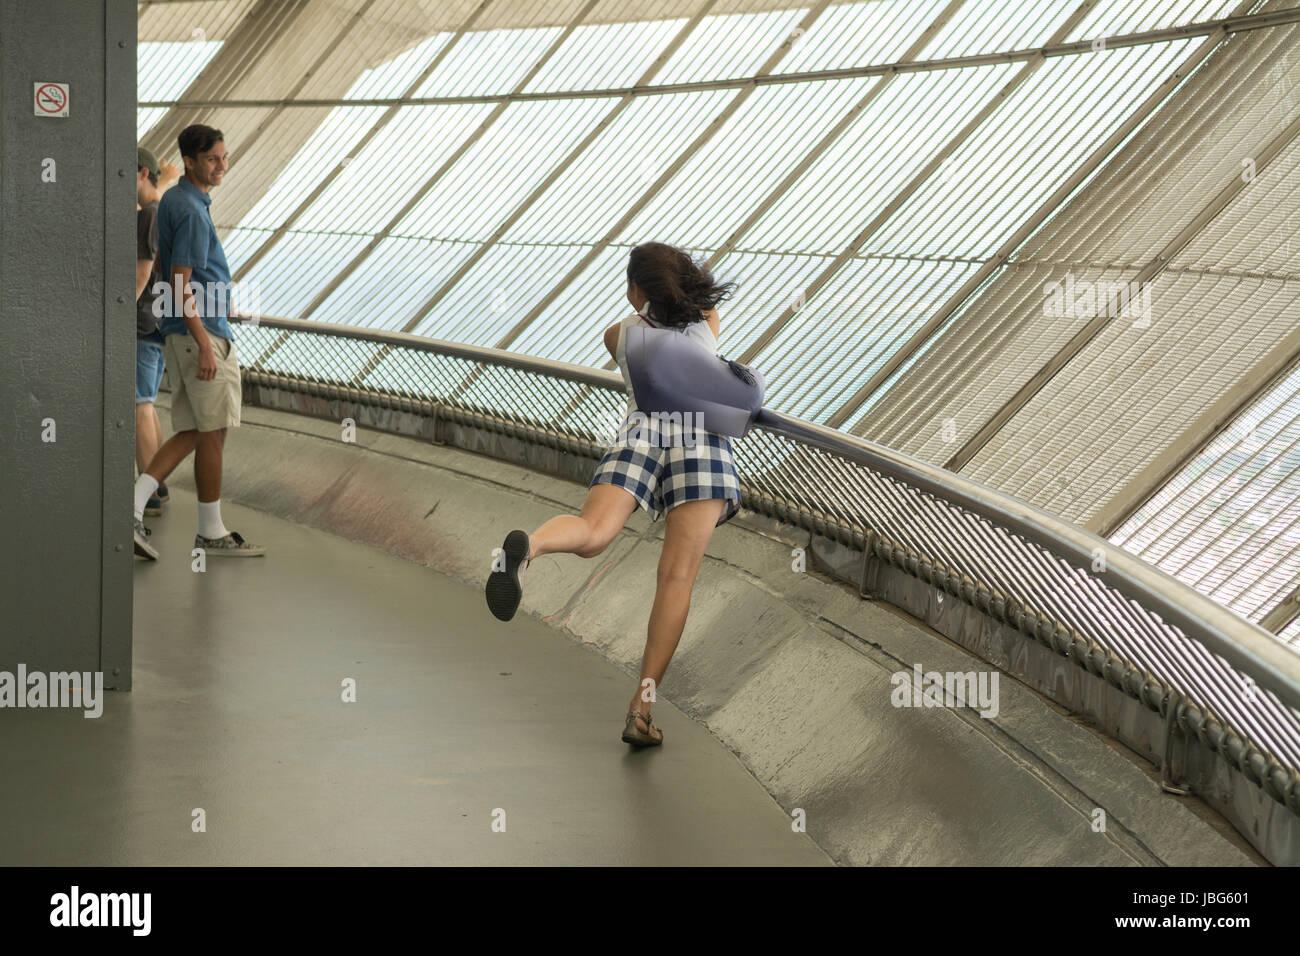 CN Tower Toronto piscine terrasse observation deck, Toronto, Ontario, Canada Photo Stock